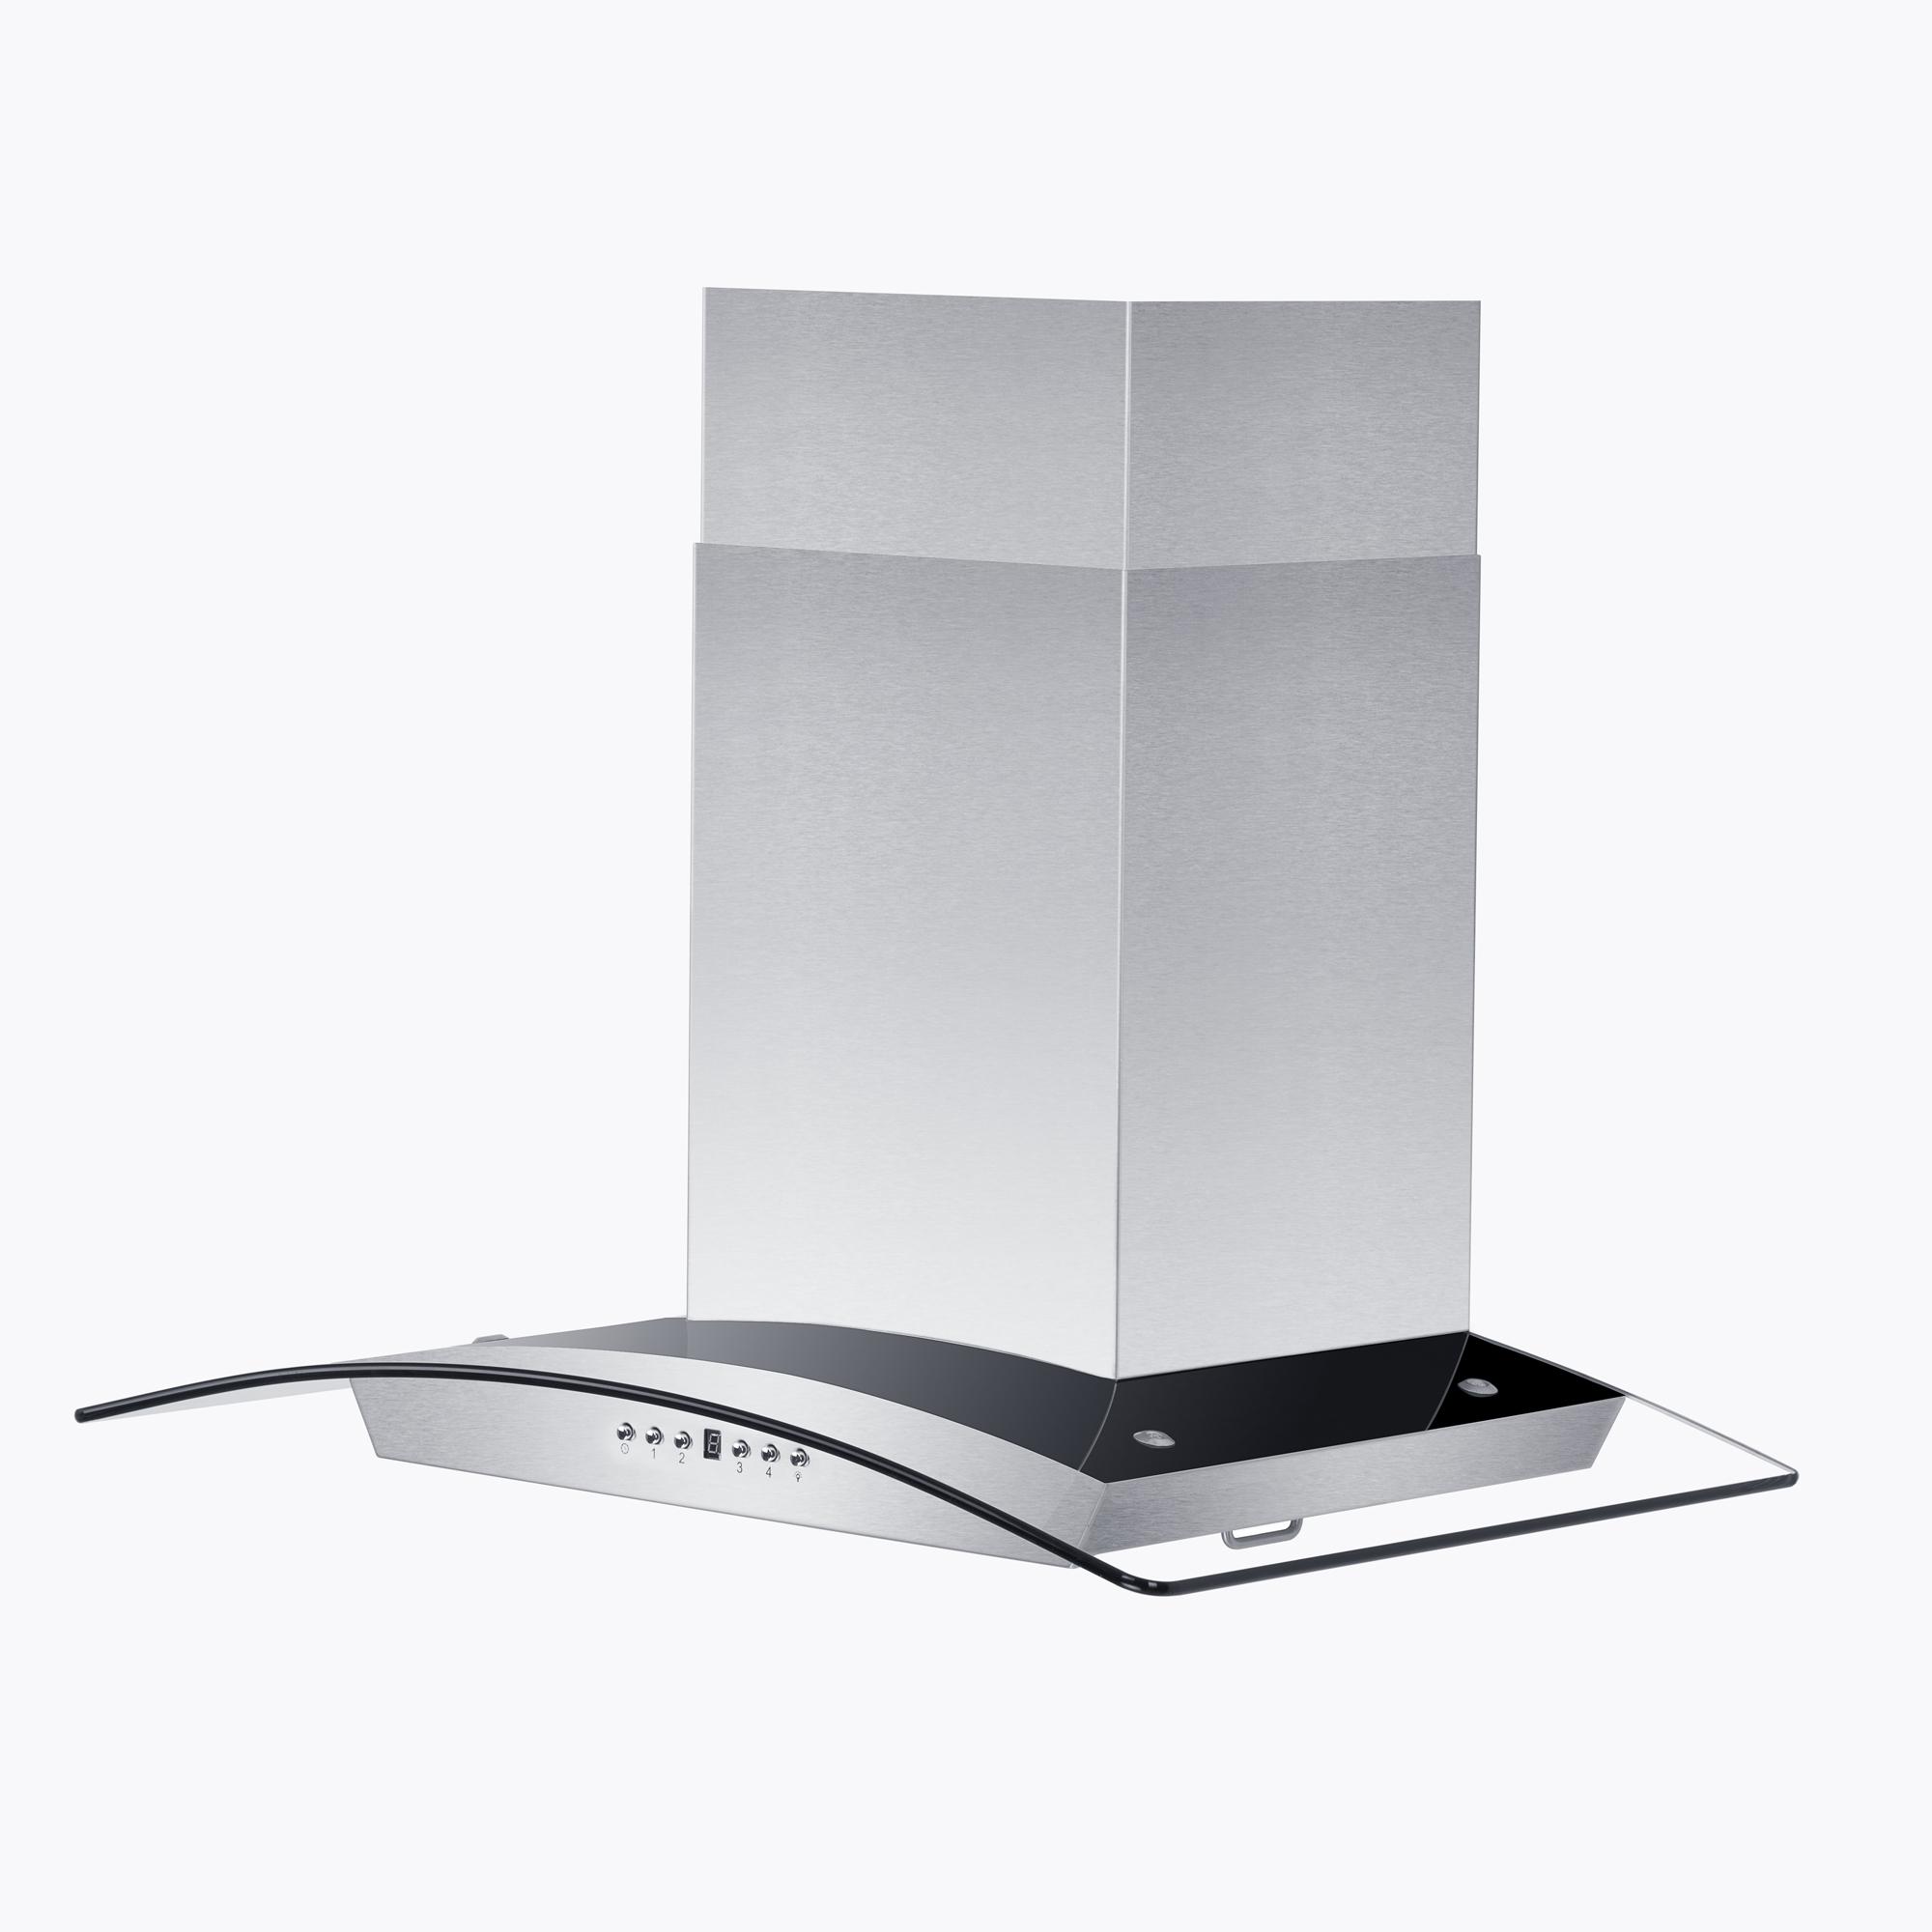 zline-stainless-steel-wall-mounted-range-hood-KZ-new-main.jpg